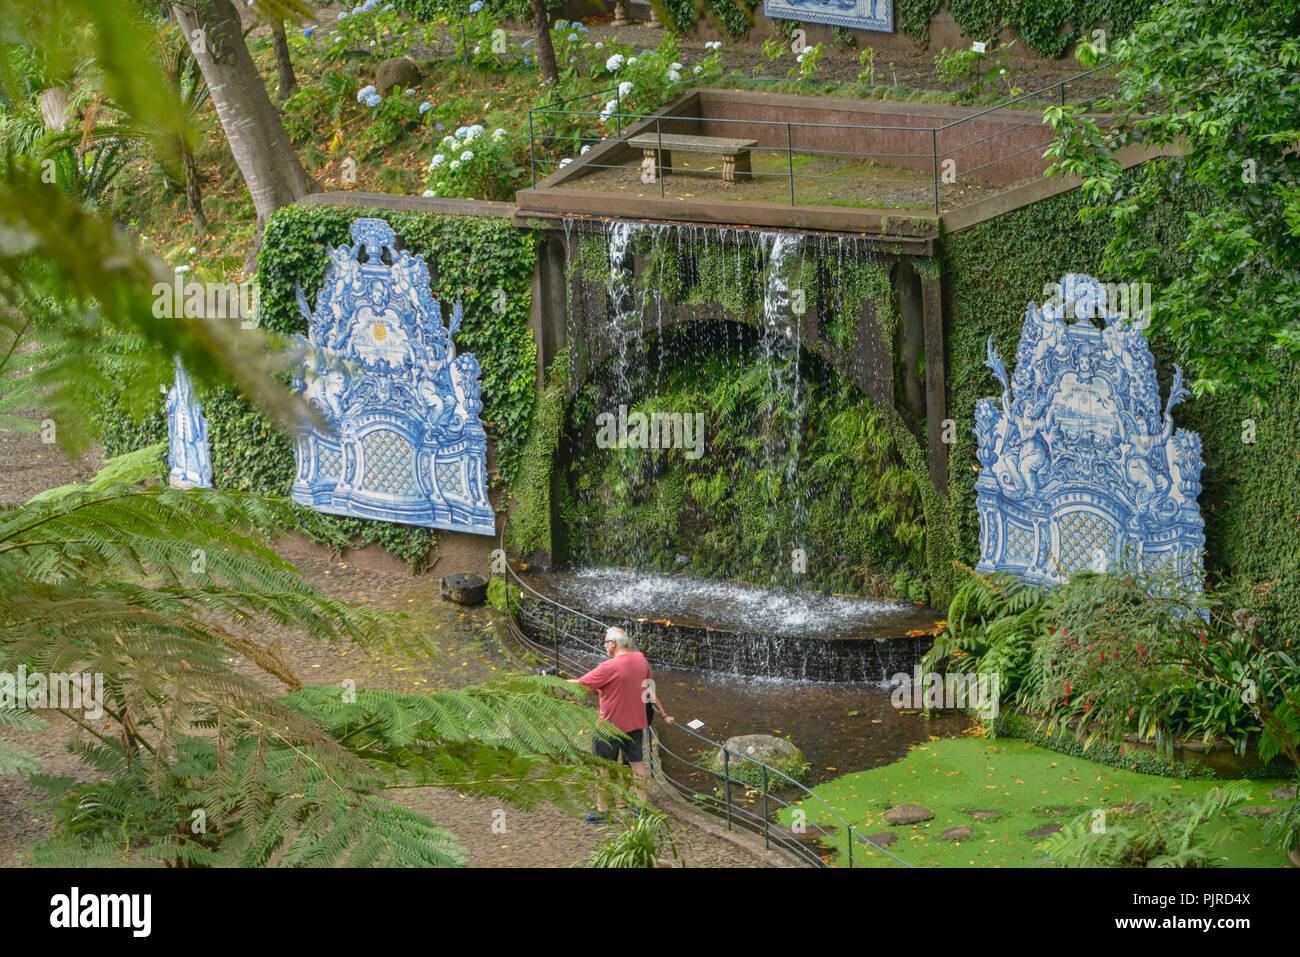 Azulejos, Monte Palace Tropical Garden, Monte, Funchal, Madeira, Portugal